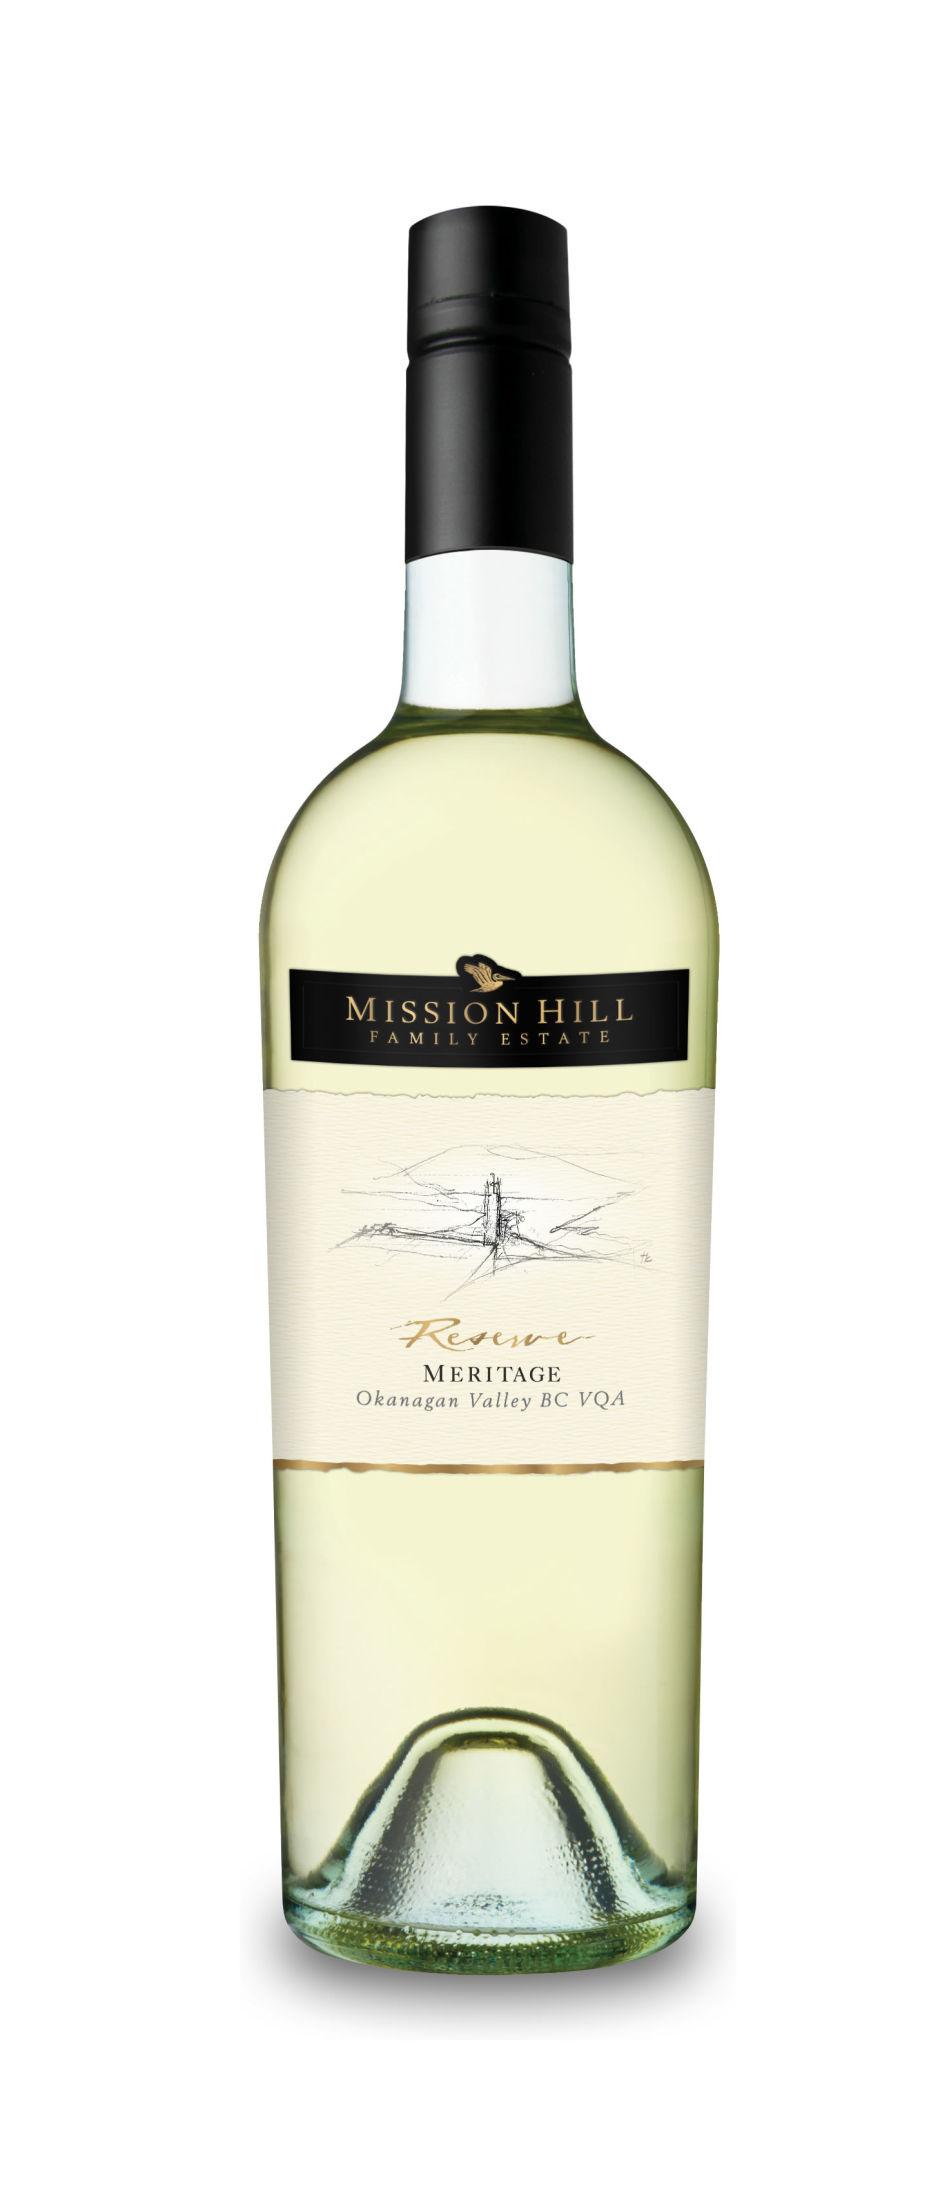 Mission Hill Reserve 2018 White Meritage ($22)